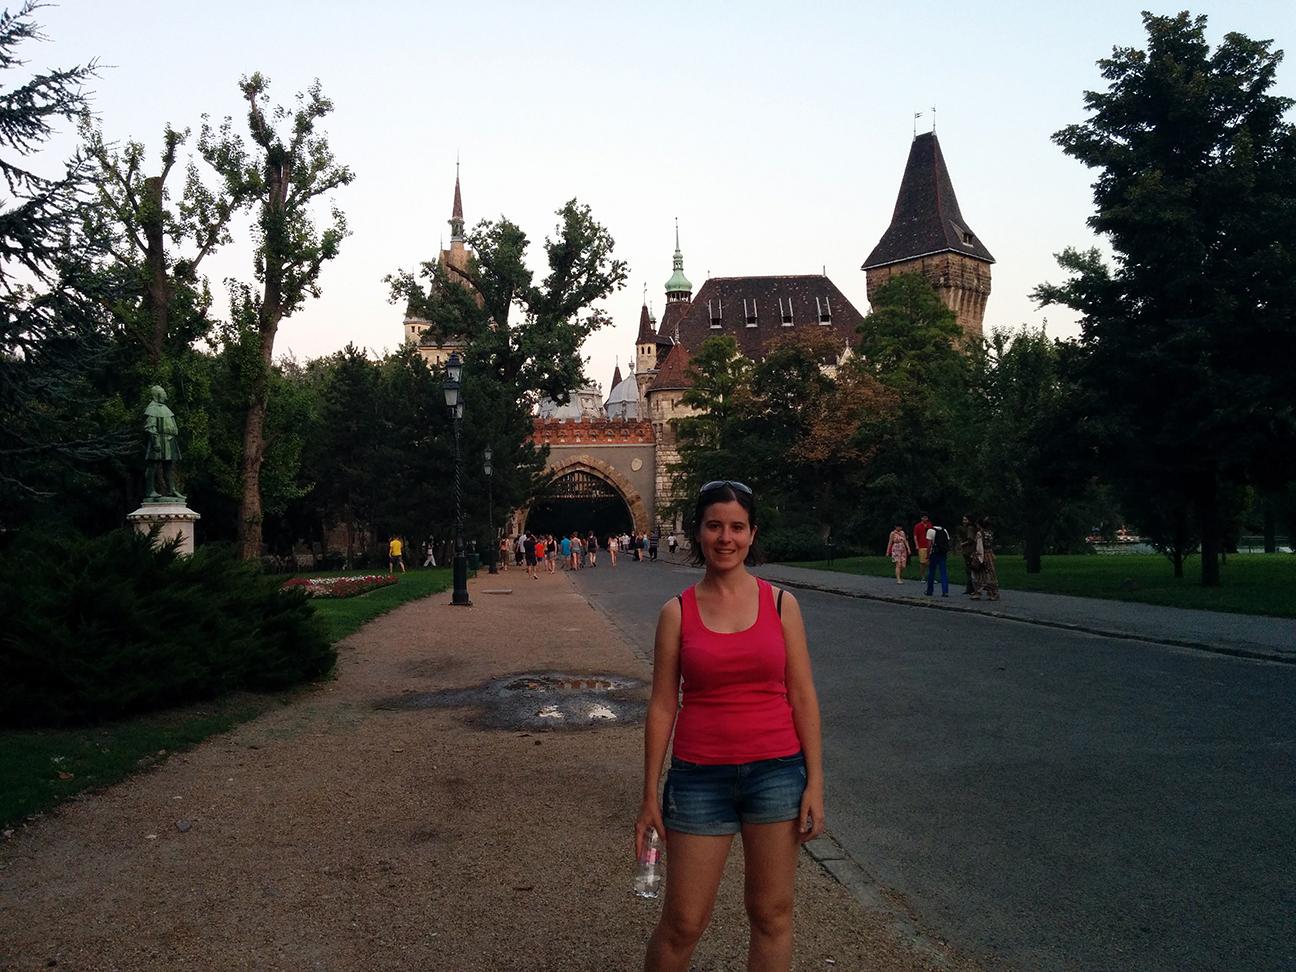 Entrada al Castillo del Parque Szechenyi